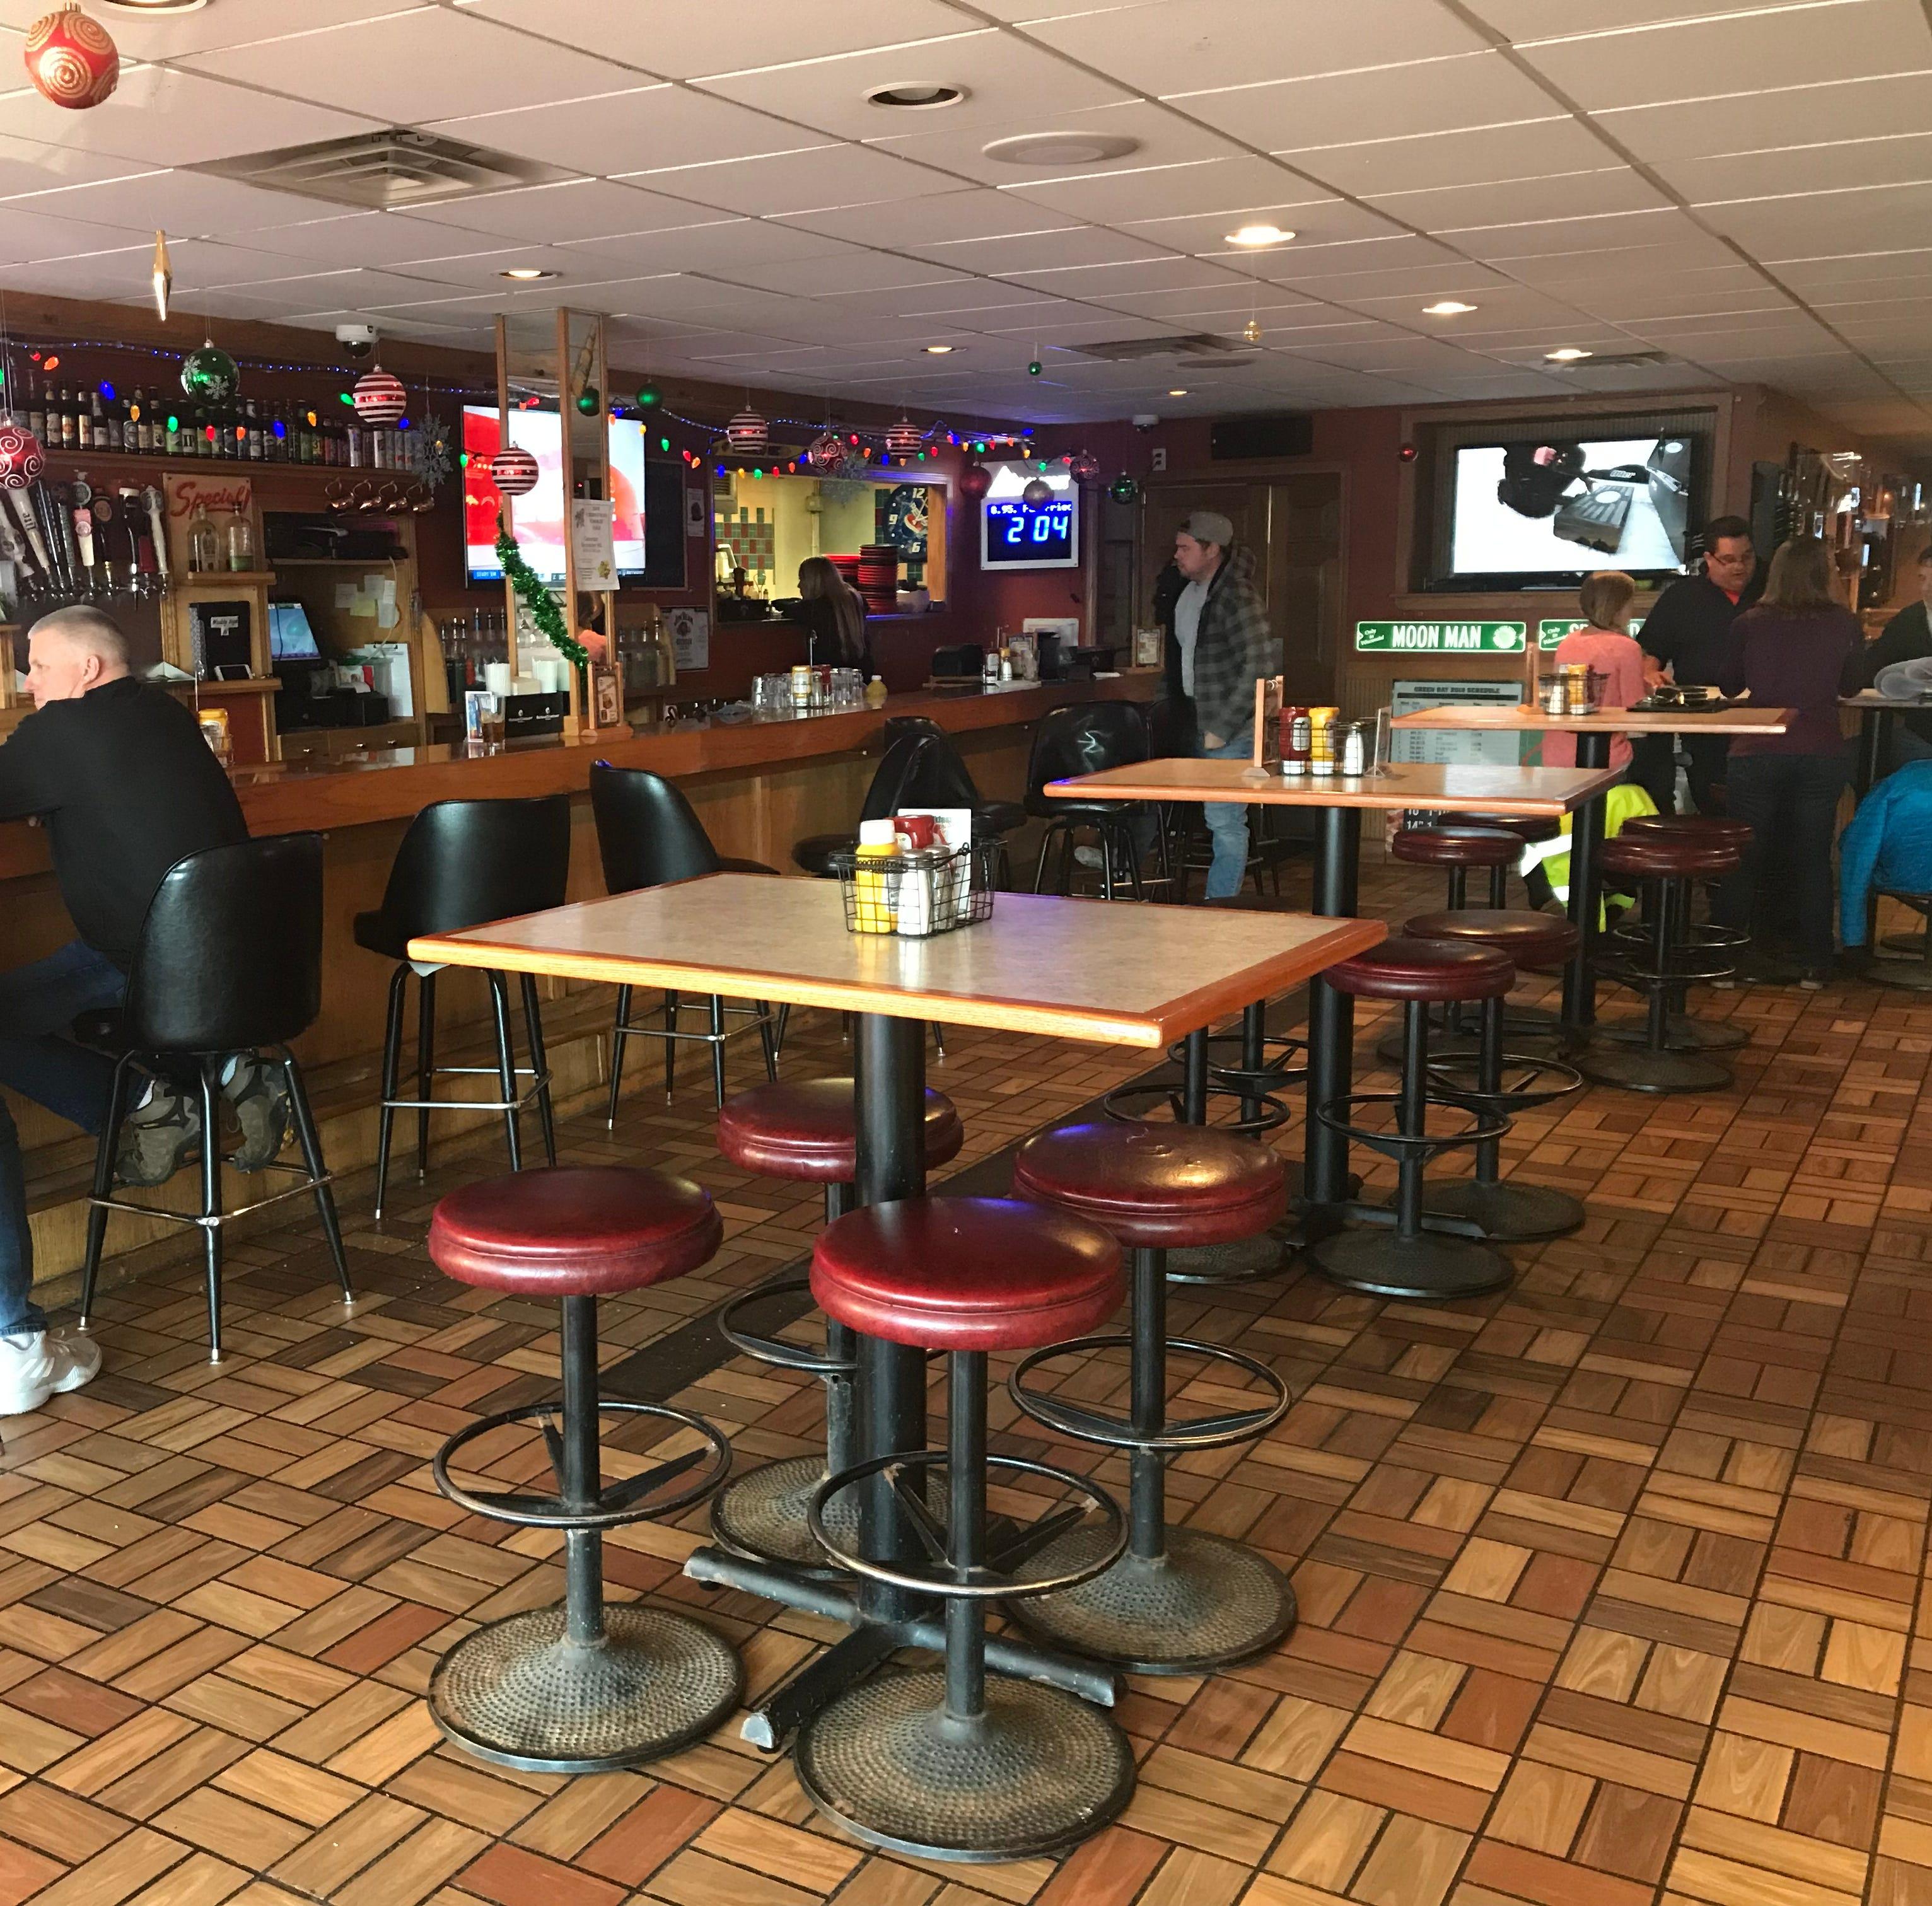 Oconomowoc's Cornerstone Sports Pub prides itself on being a cornerstone of the community